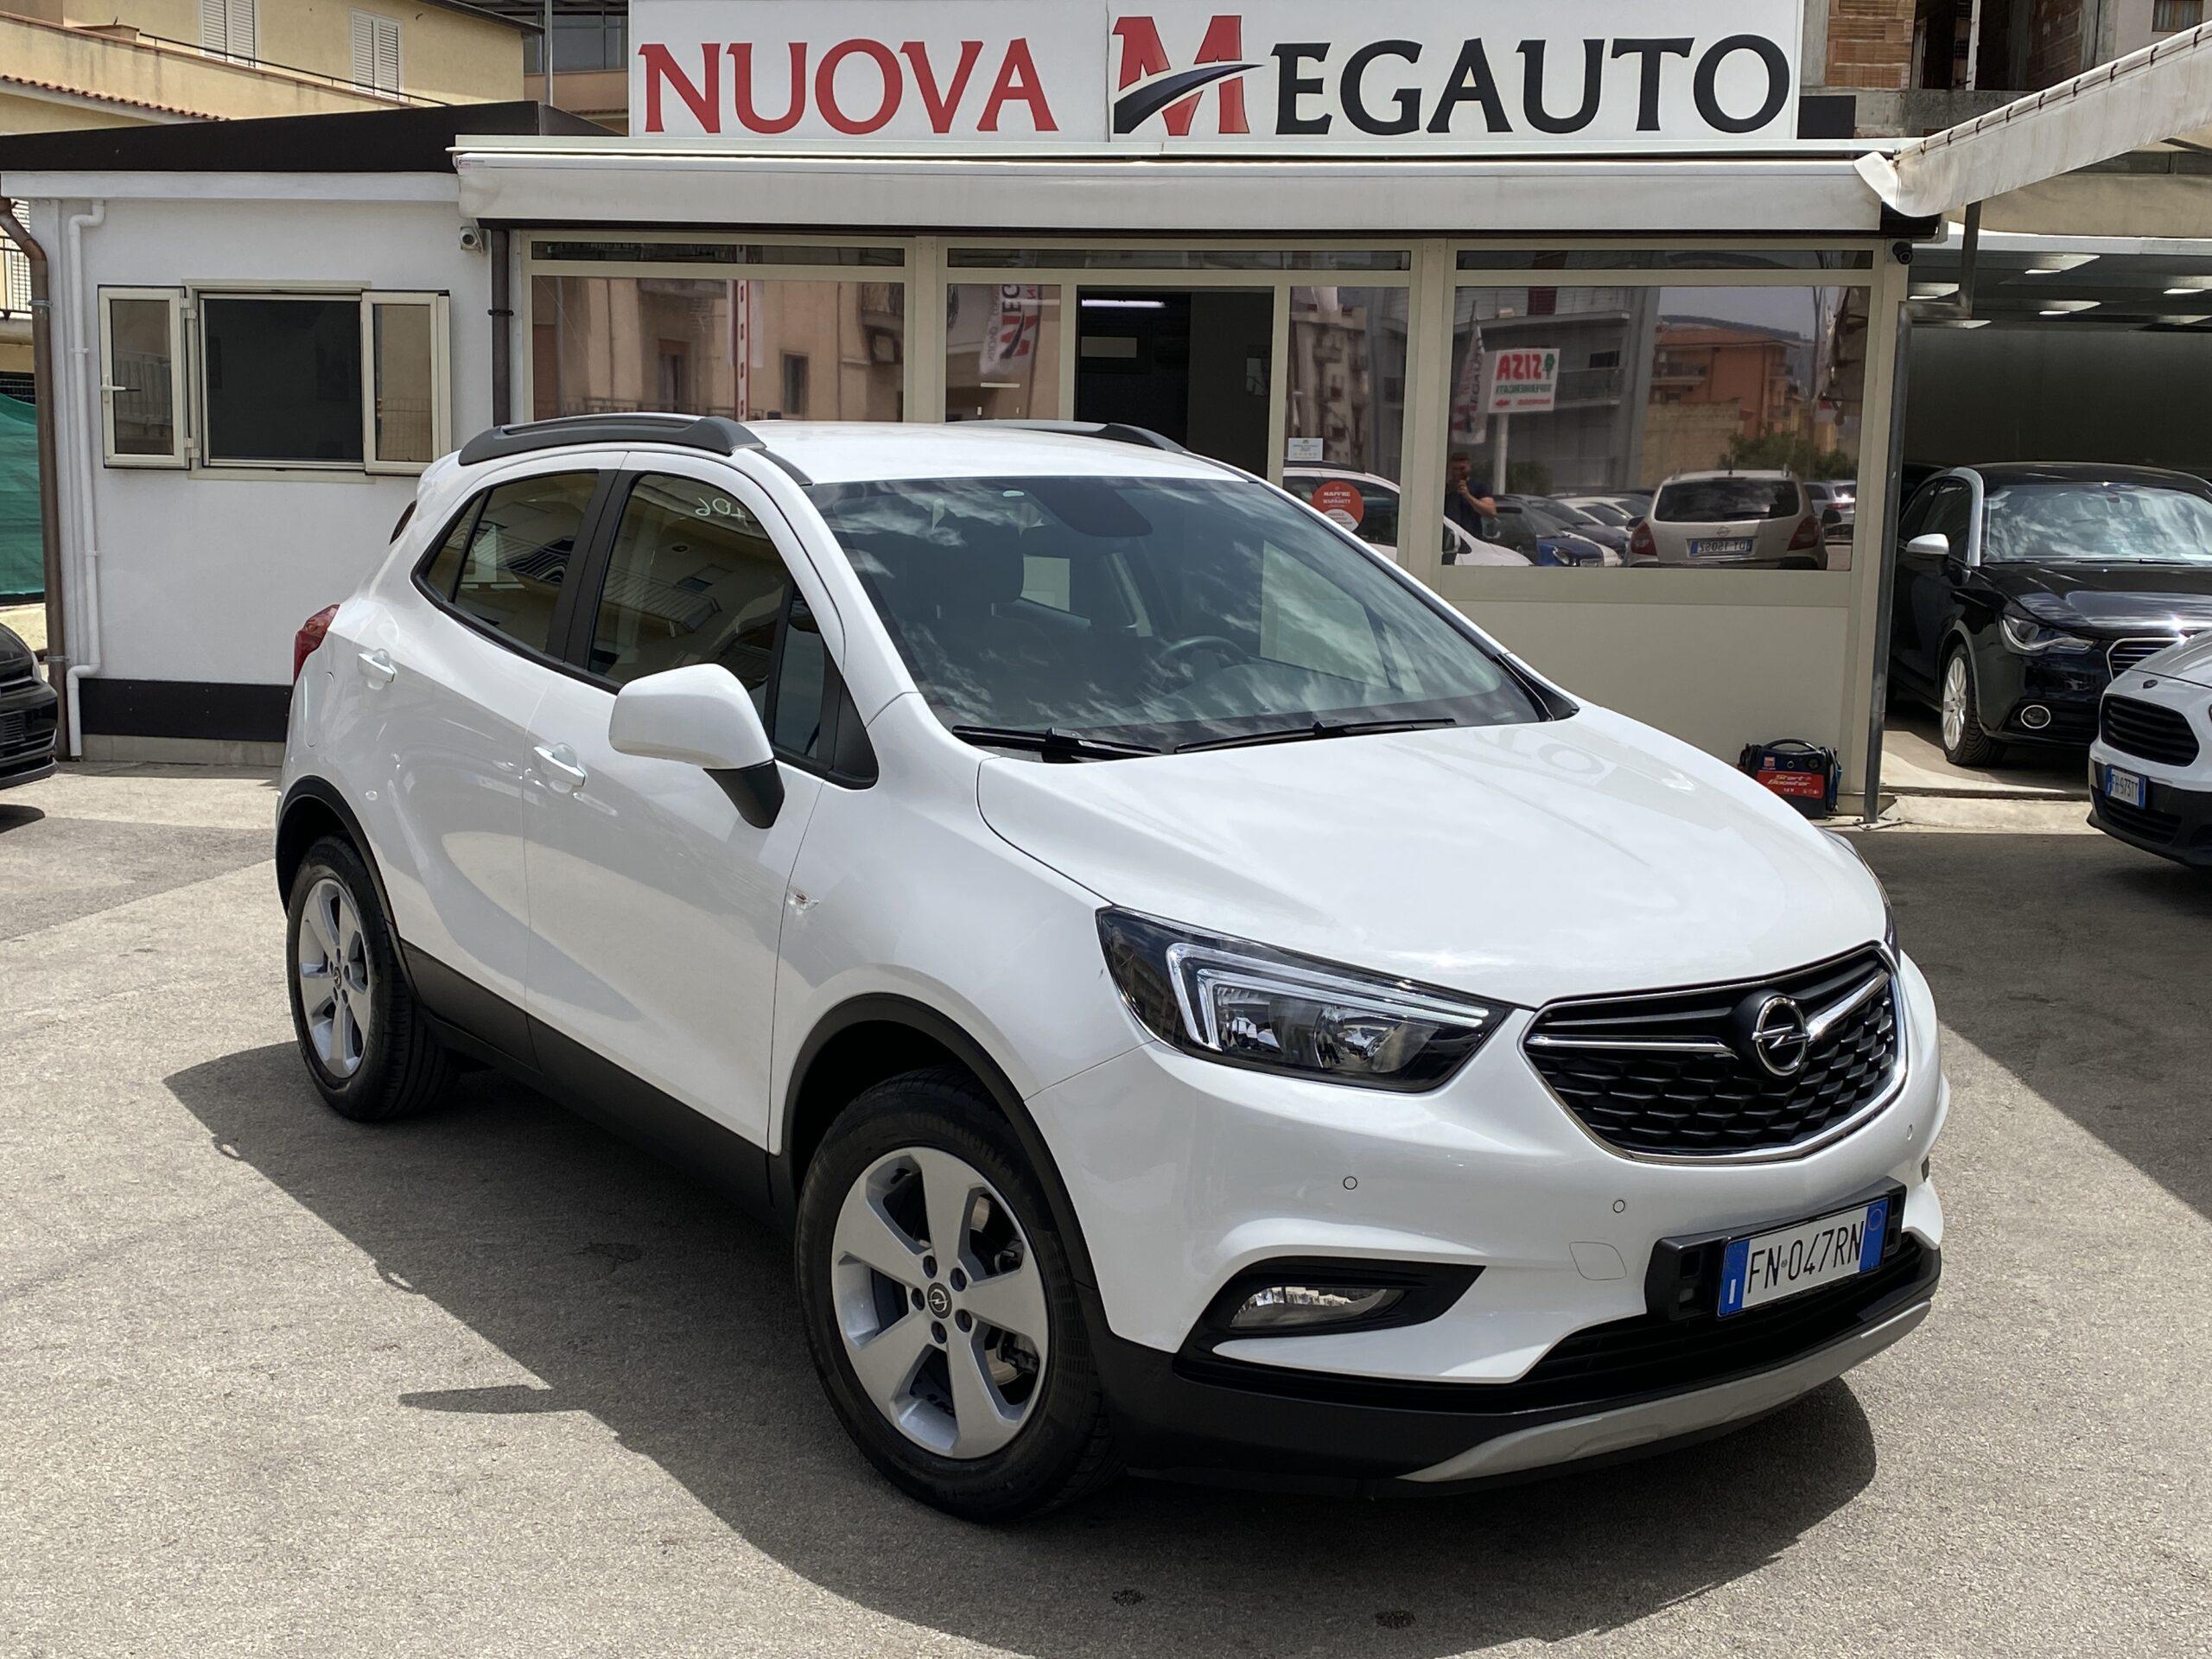 Opel Mokka 1.6 CDTI Ecotec 4×2 Start&Stop Innovation